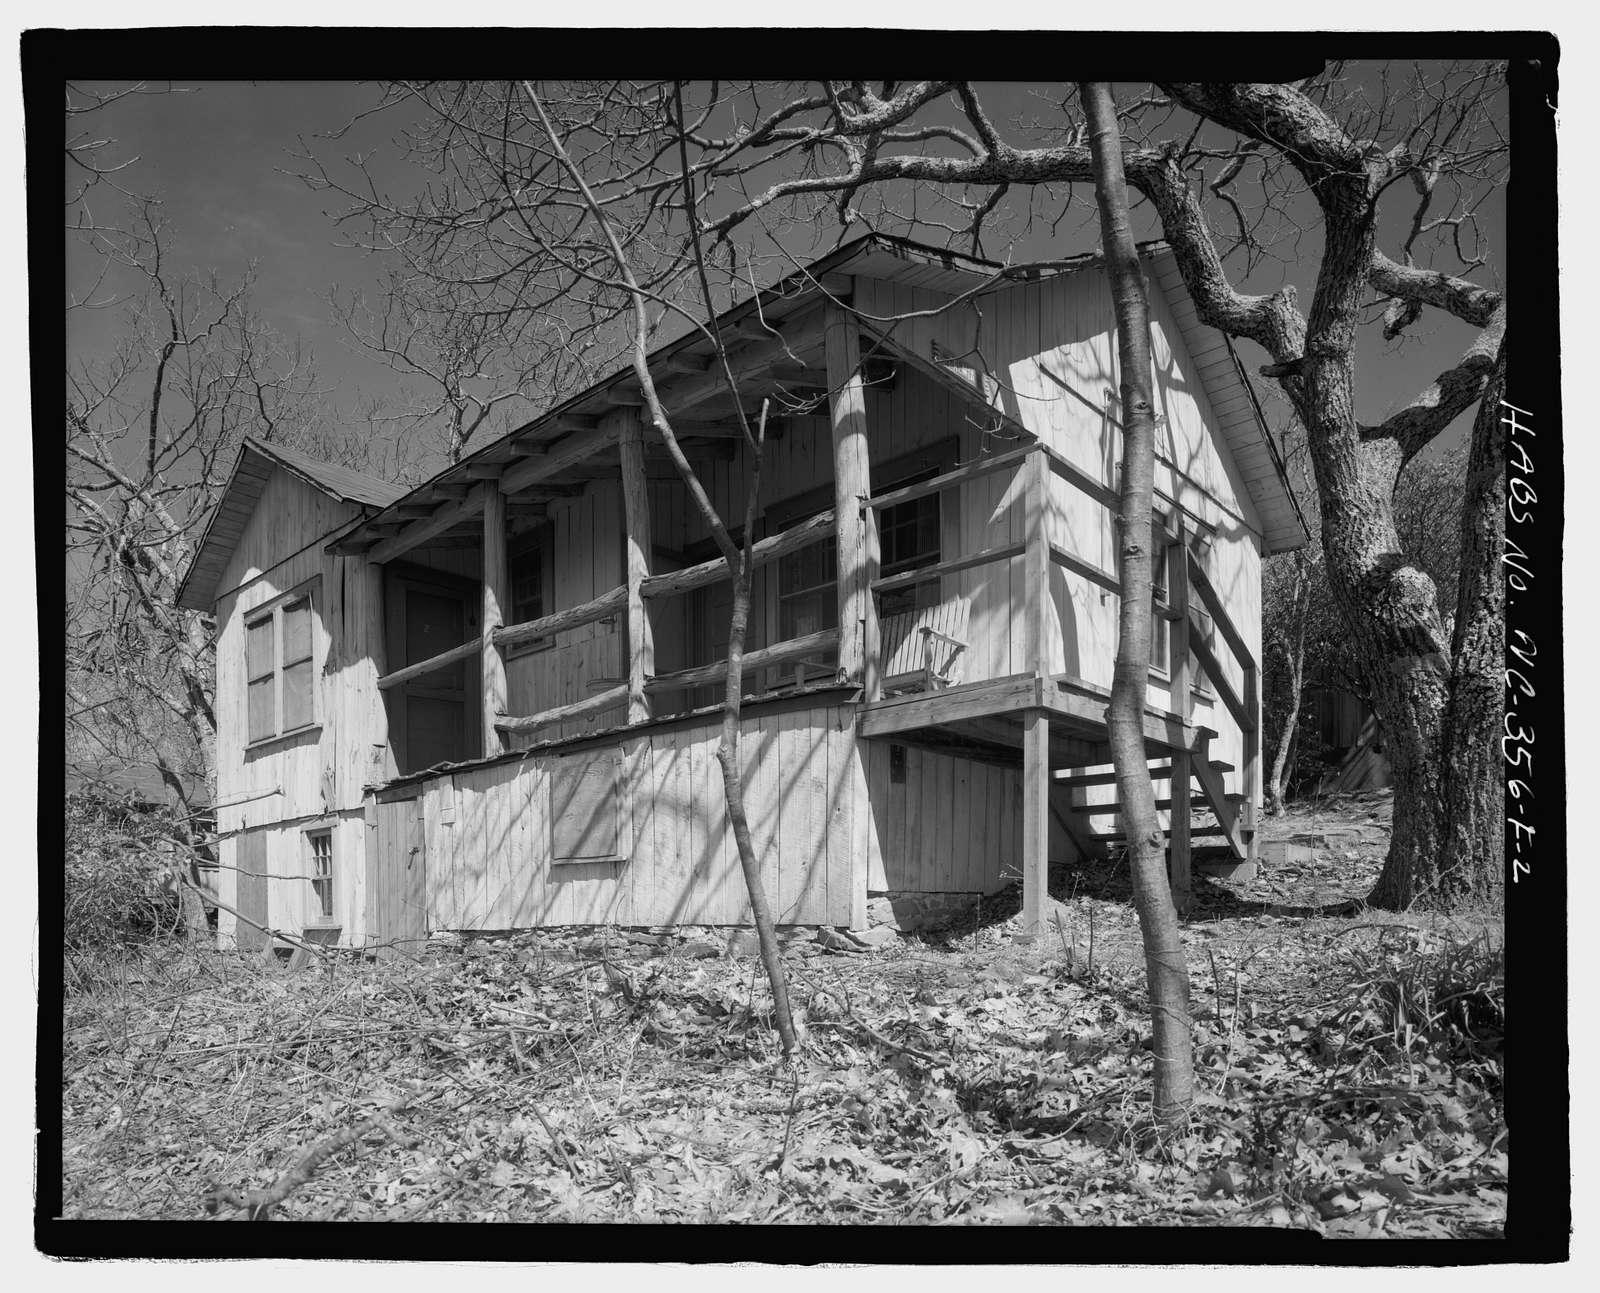 Pisgah National Forest Inn, Kalmia Cabin, Blue Ridge Parkway Milepost 408.6, Asheville, Buncombe County, NC